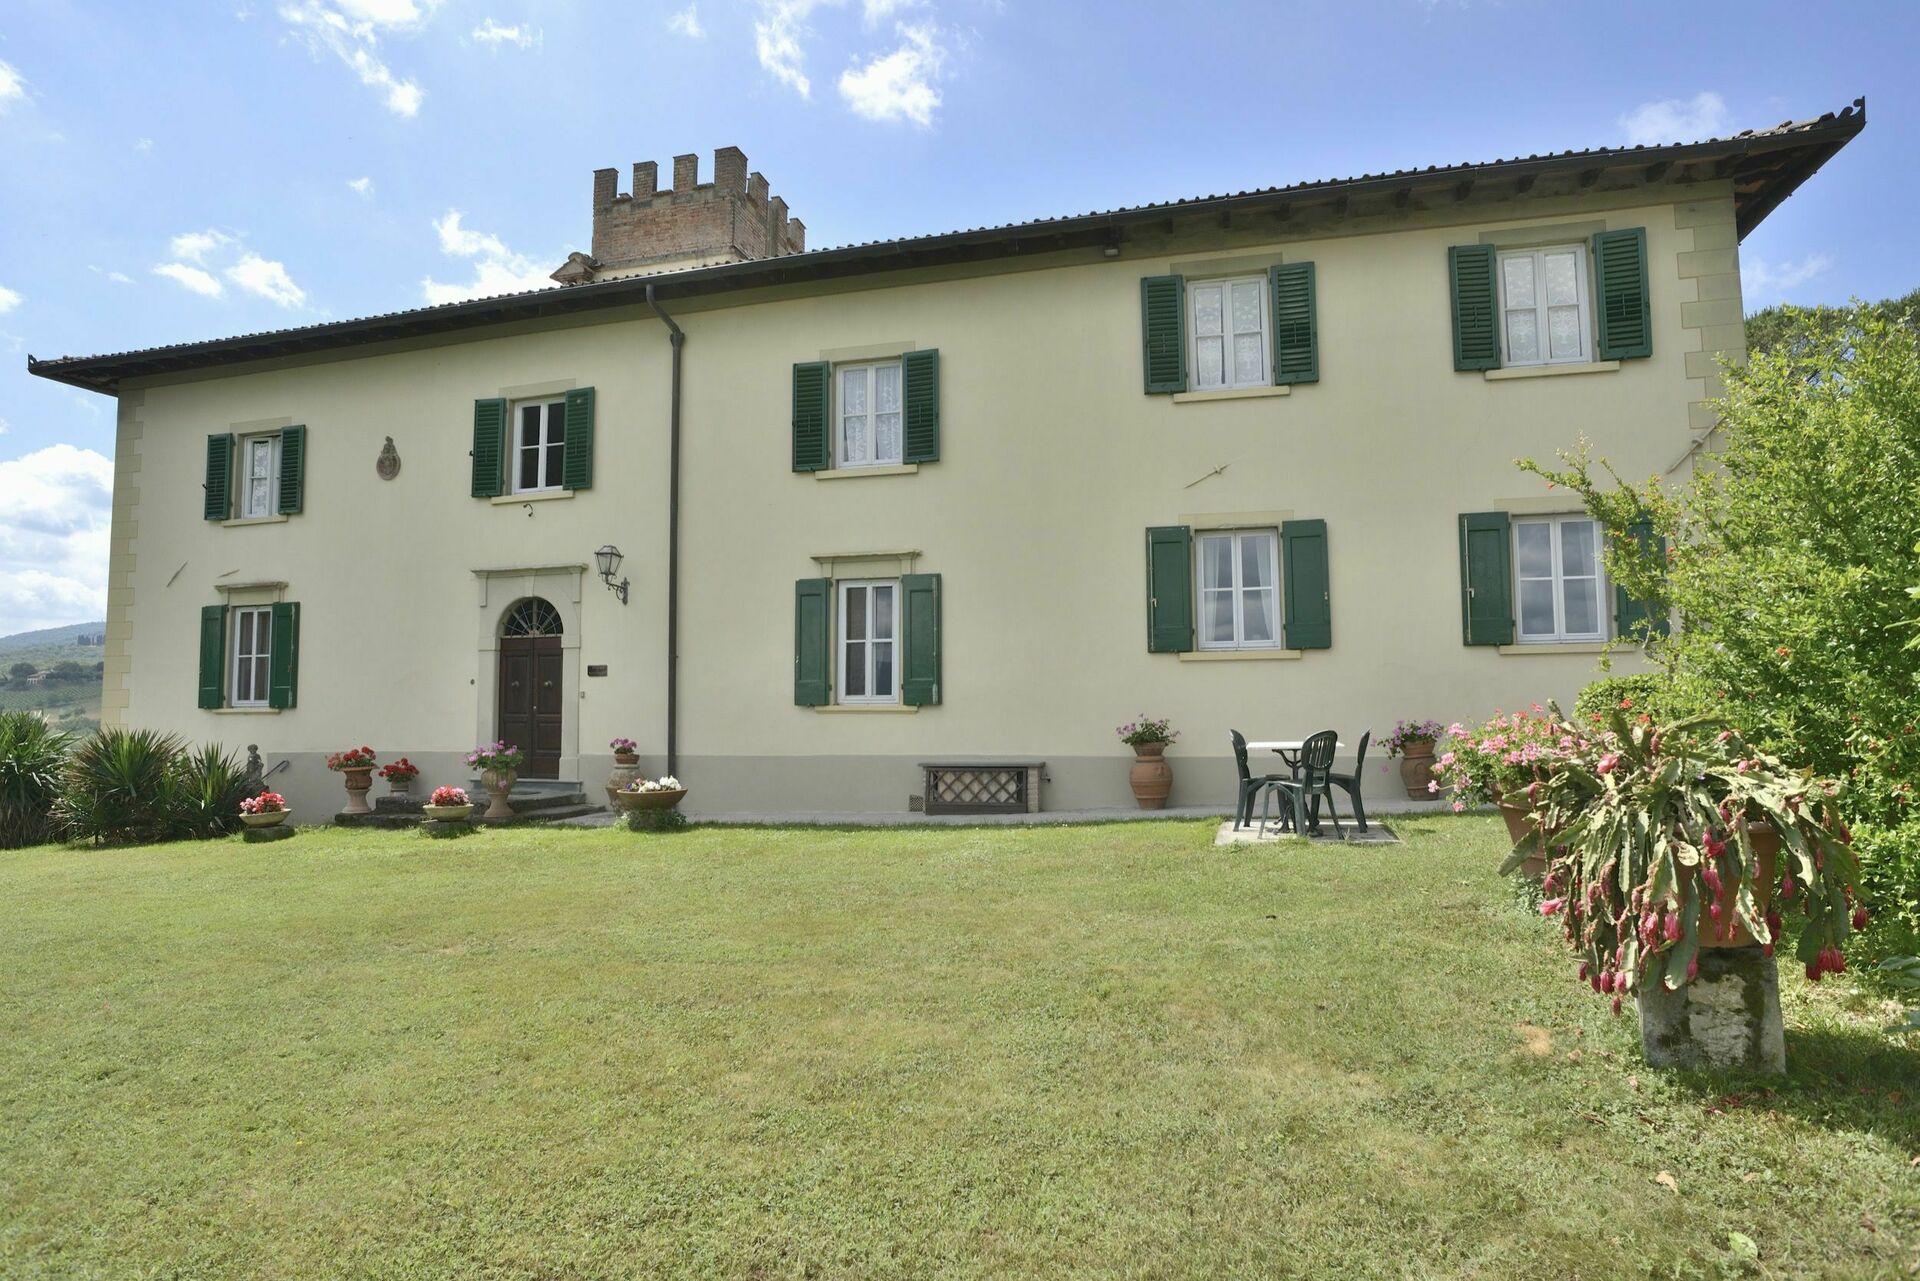 Sommerhus Villa Mugello i Borgo San Lorenzo Toscana - 8 soveværelser ...